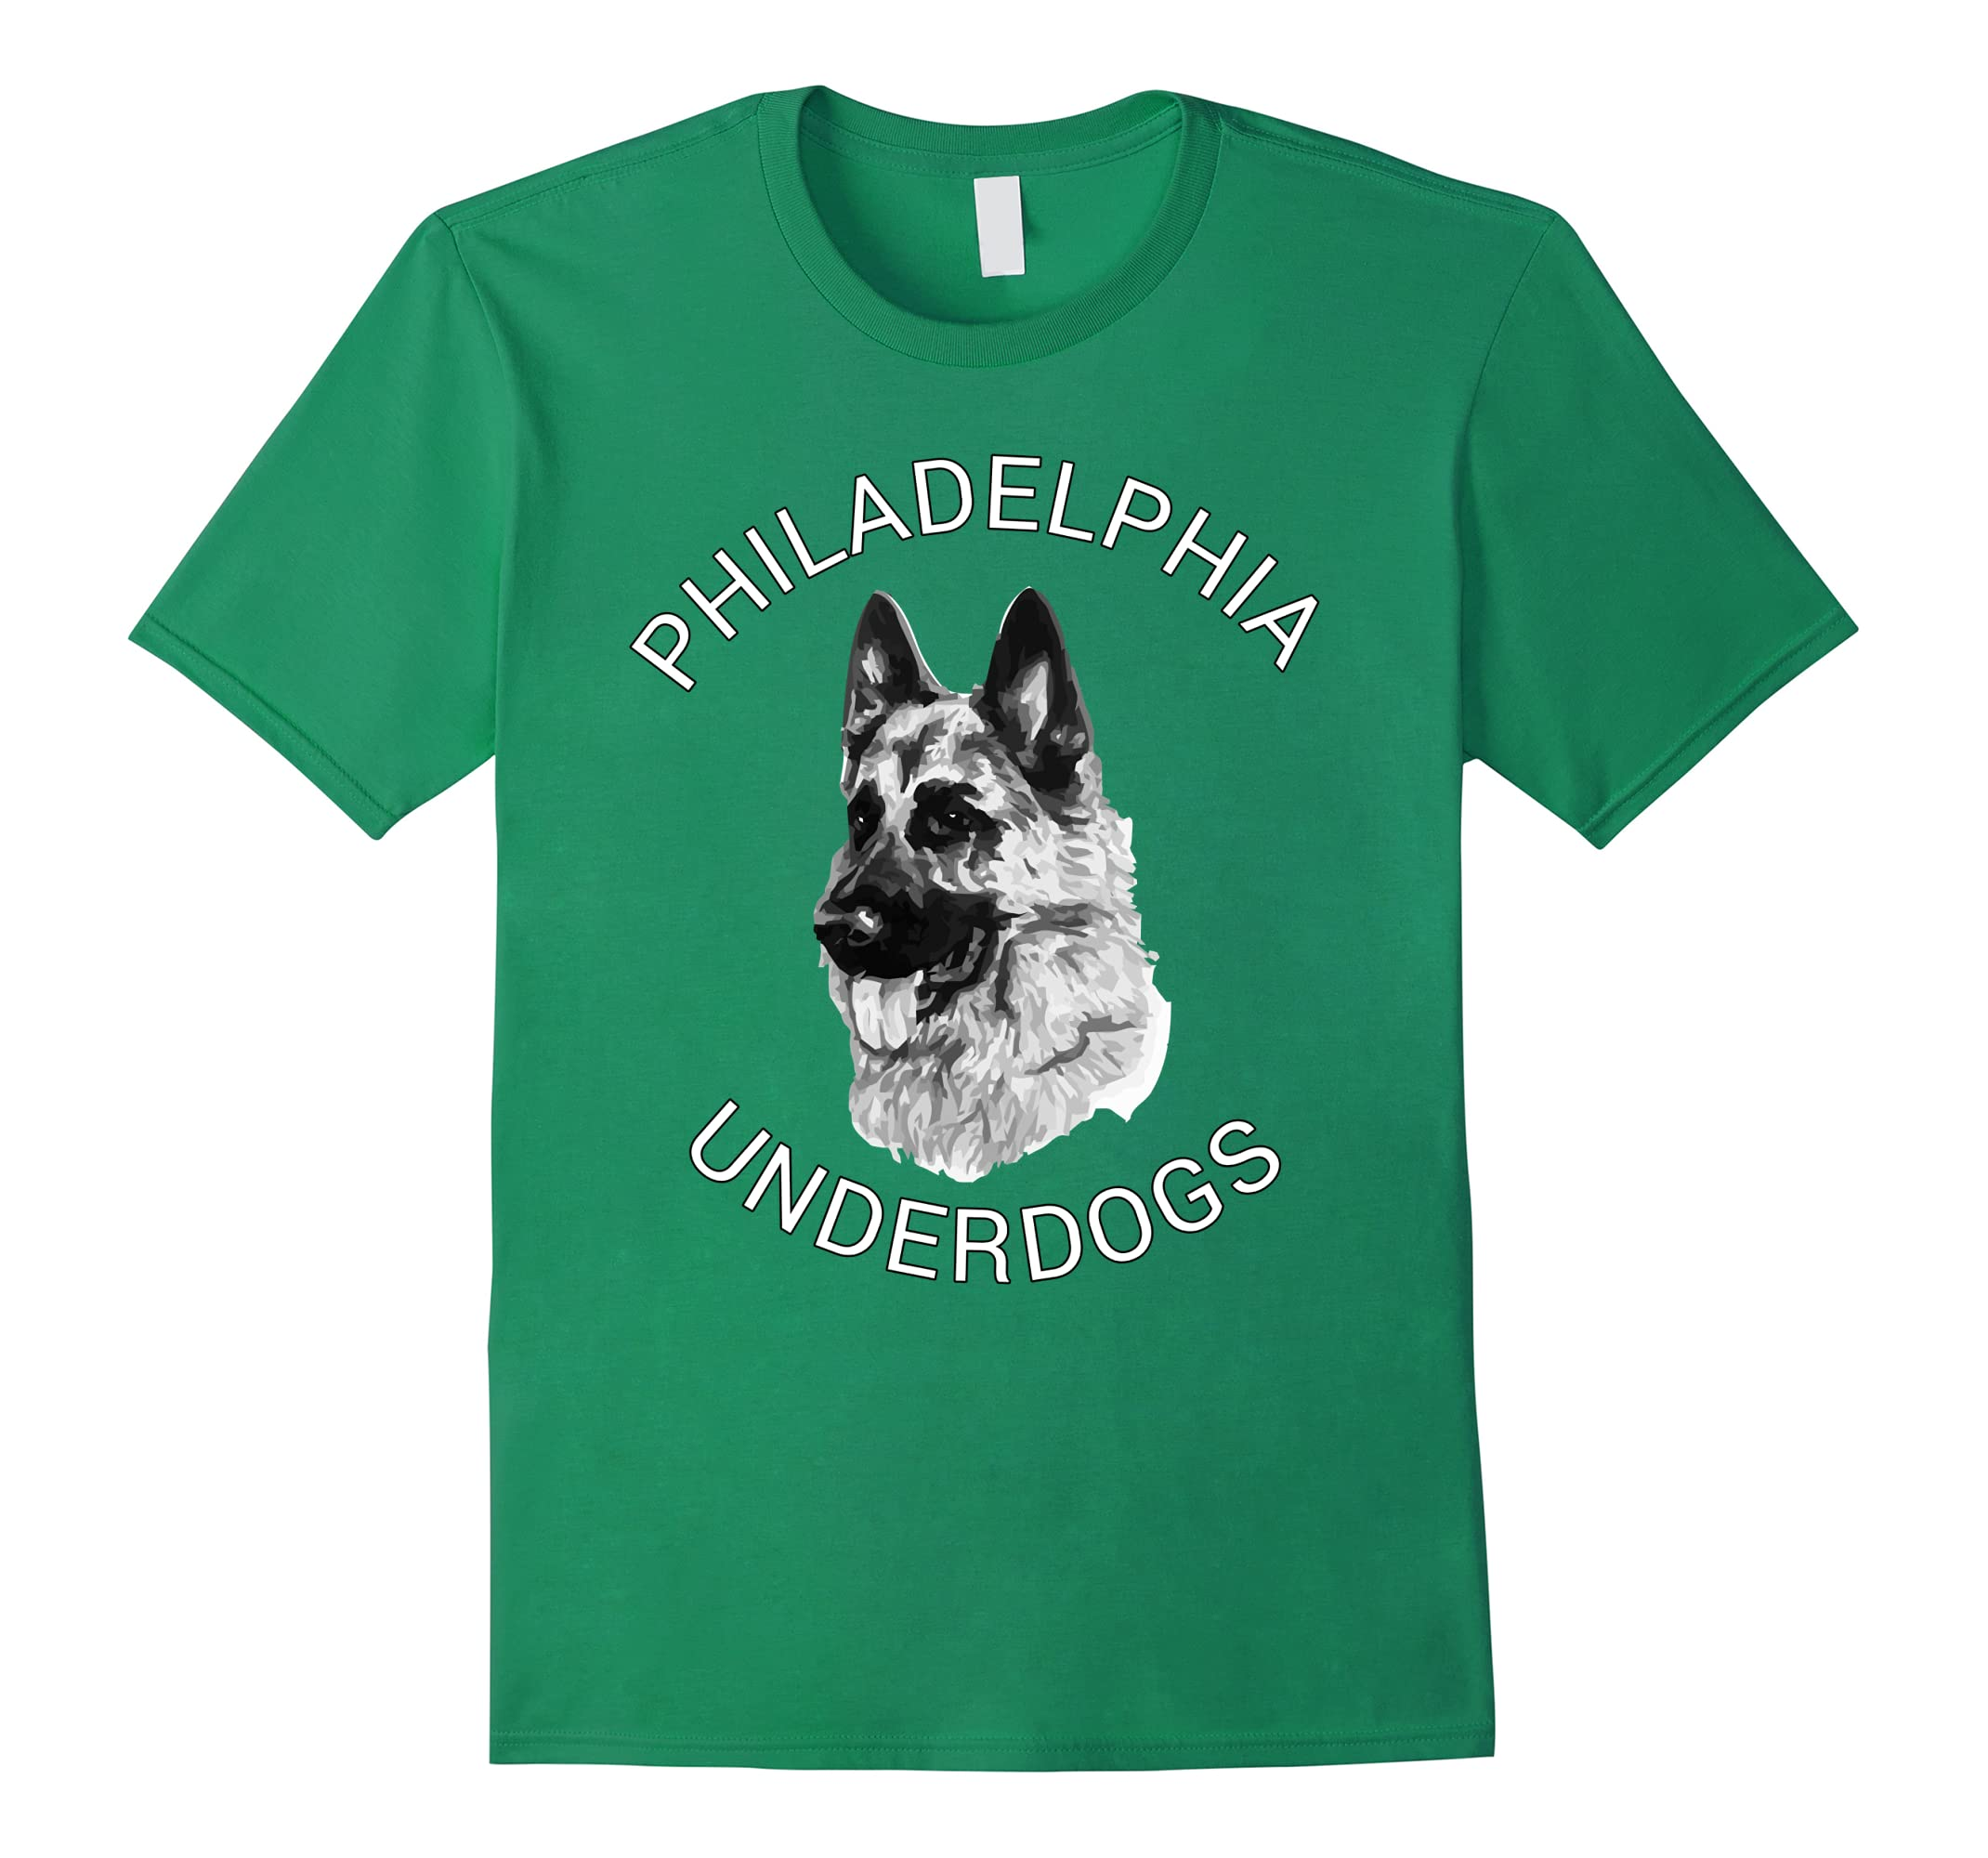 2018 Philadelphia Underdogs Funny Shirt-ah my shirt one gift